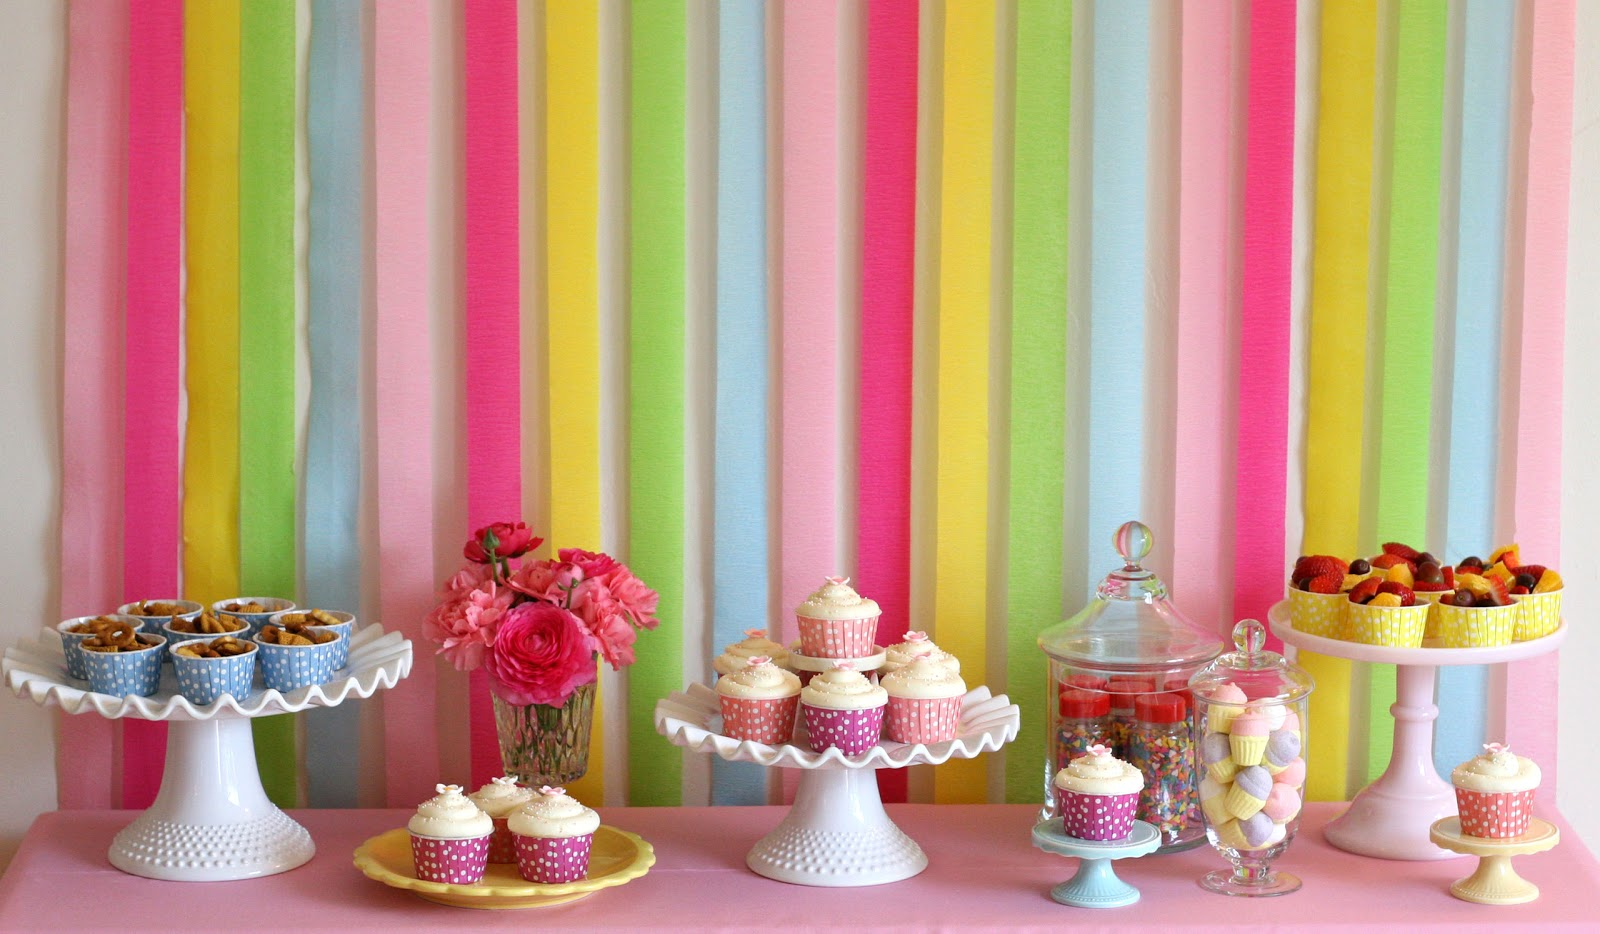 Graces Cake Decorating Party